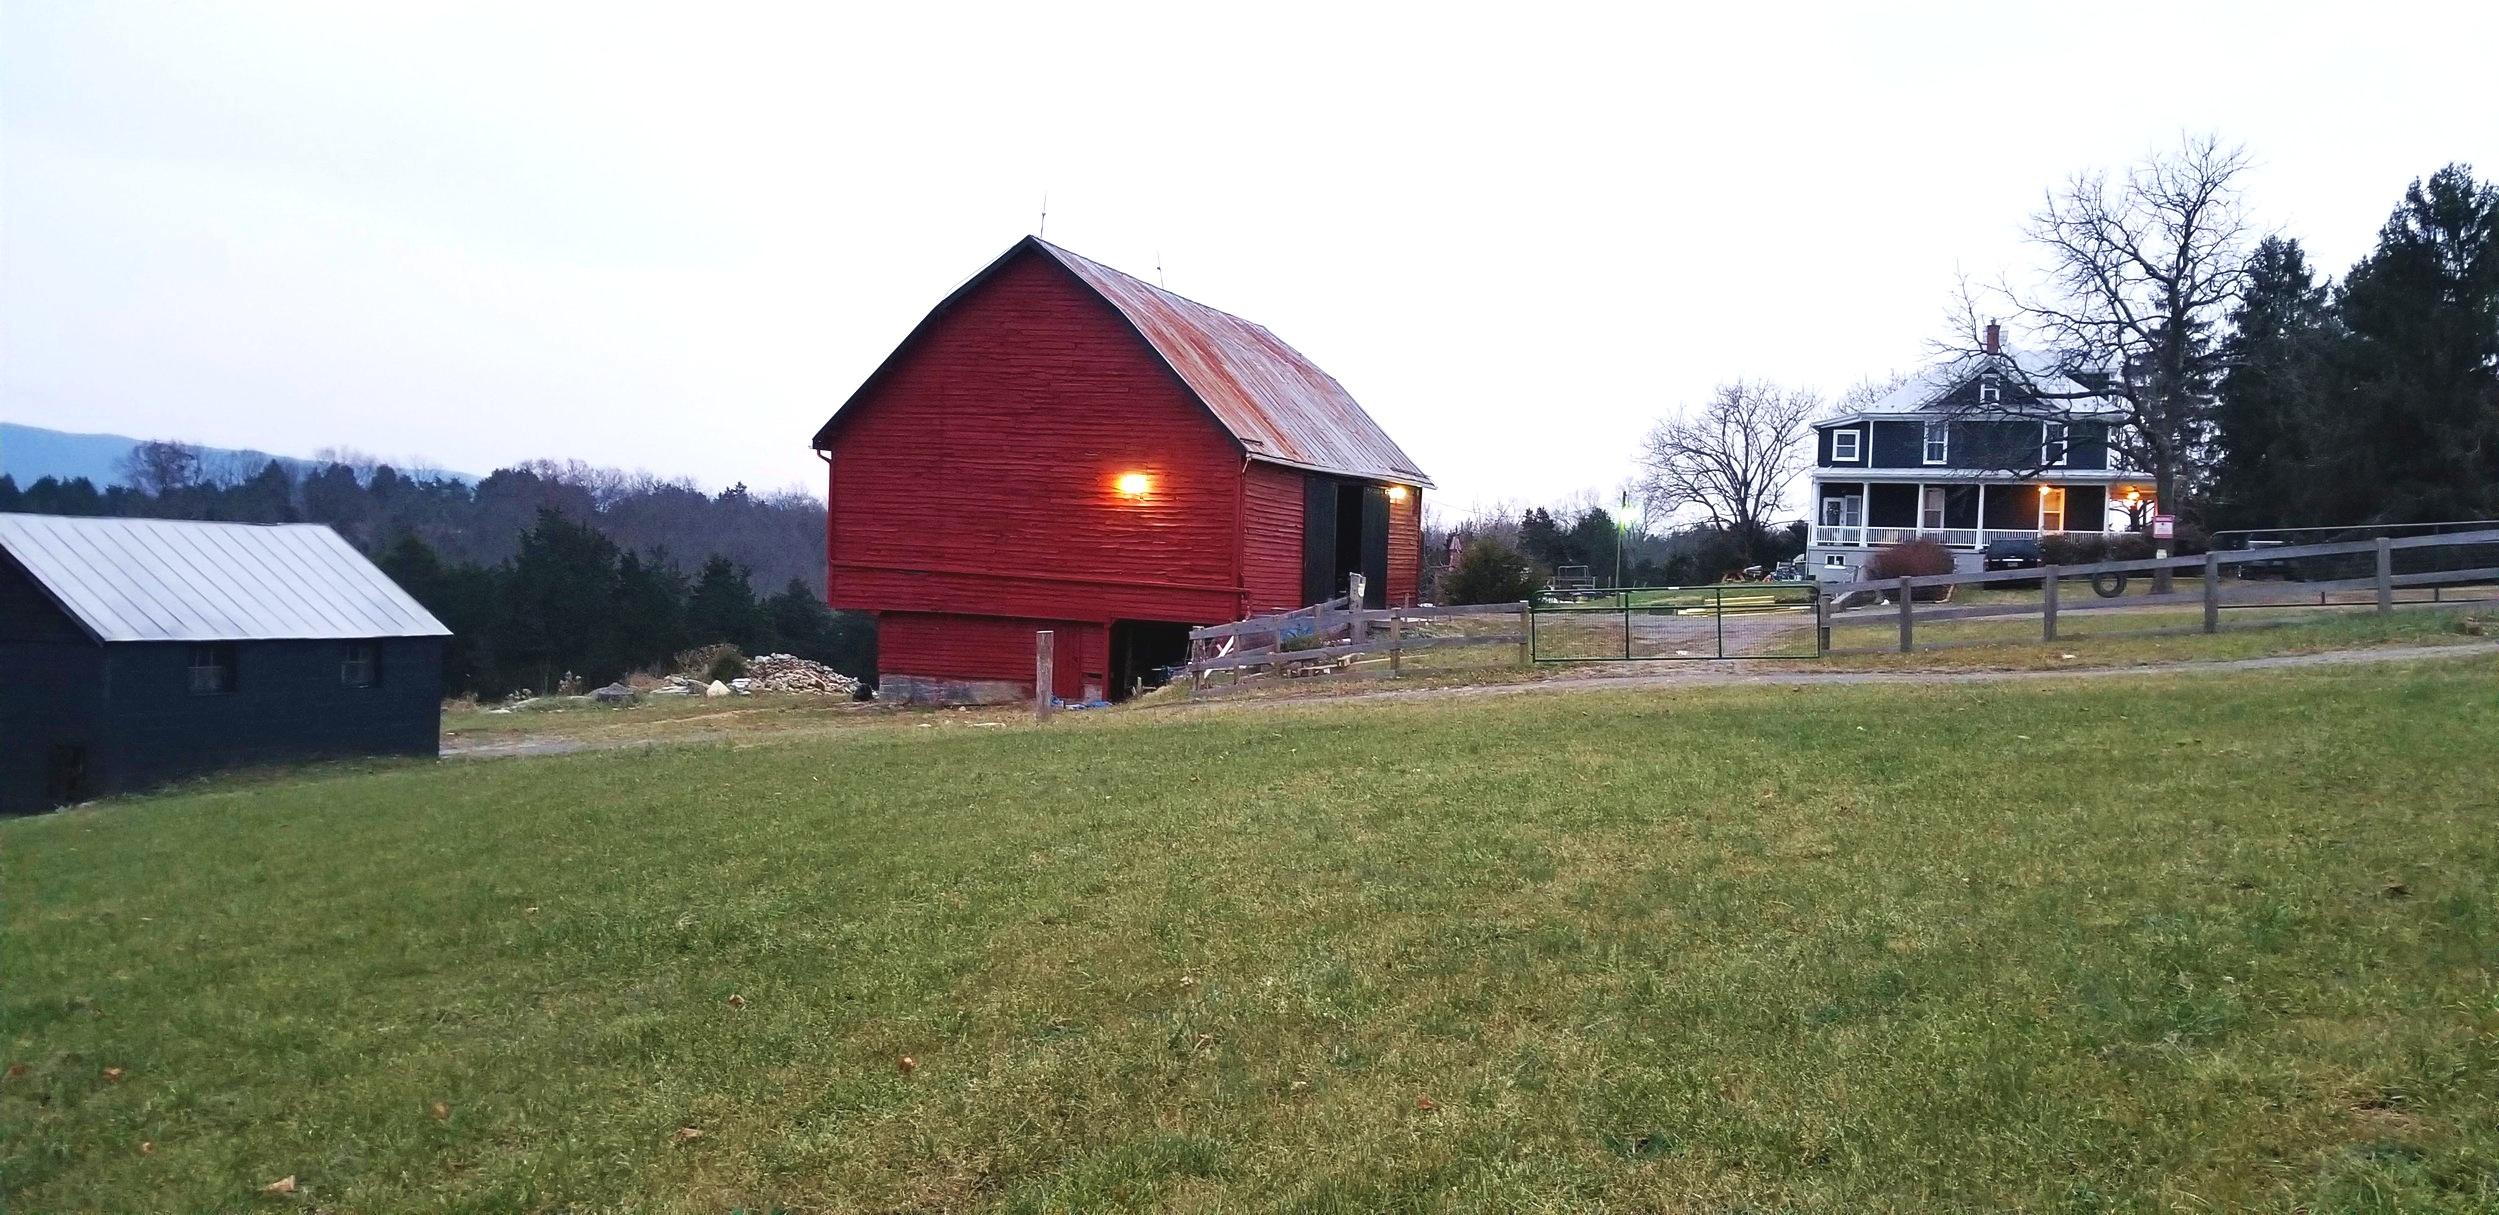 The Bullard Family Property Near StrasBurg, VA.